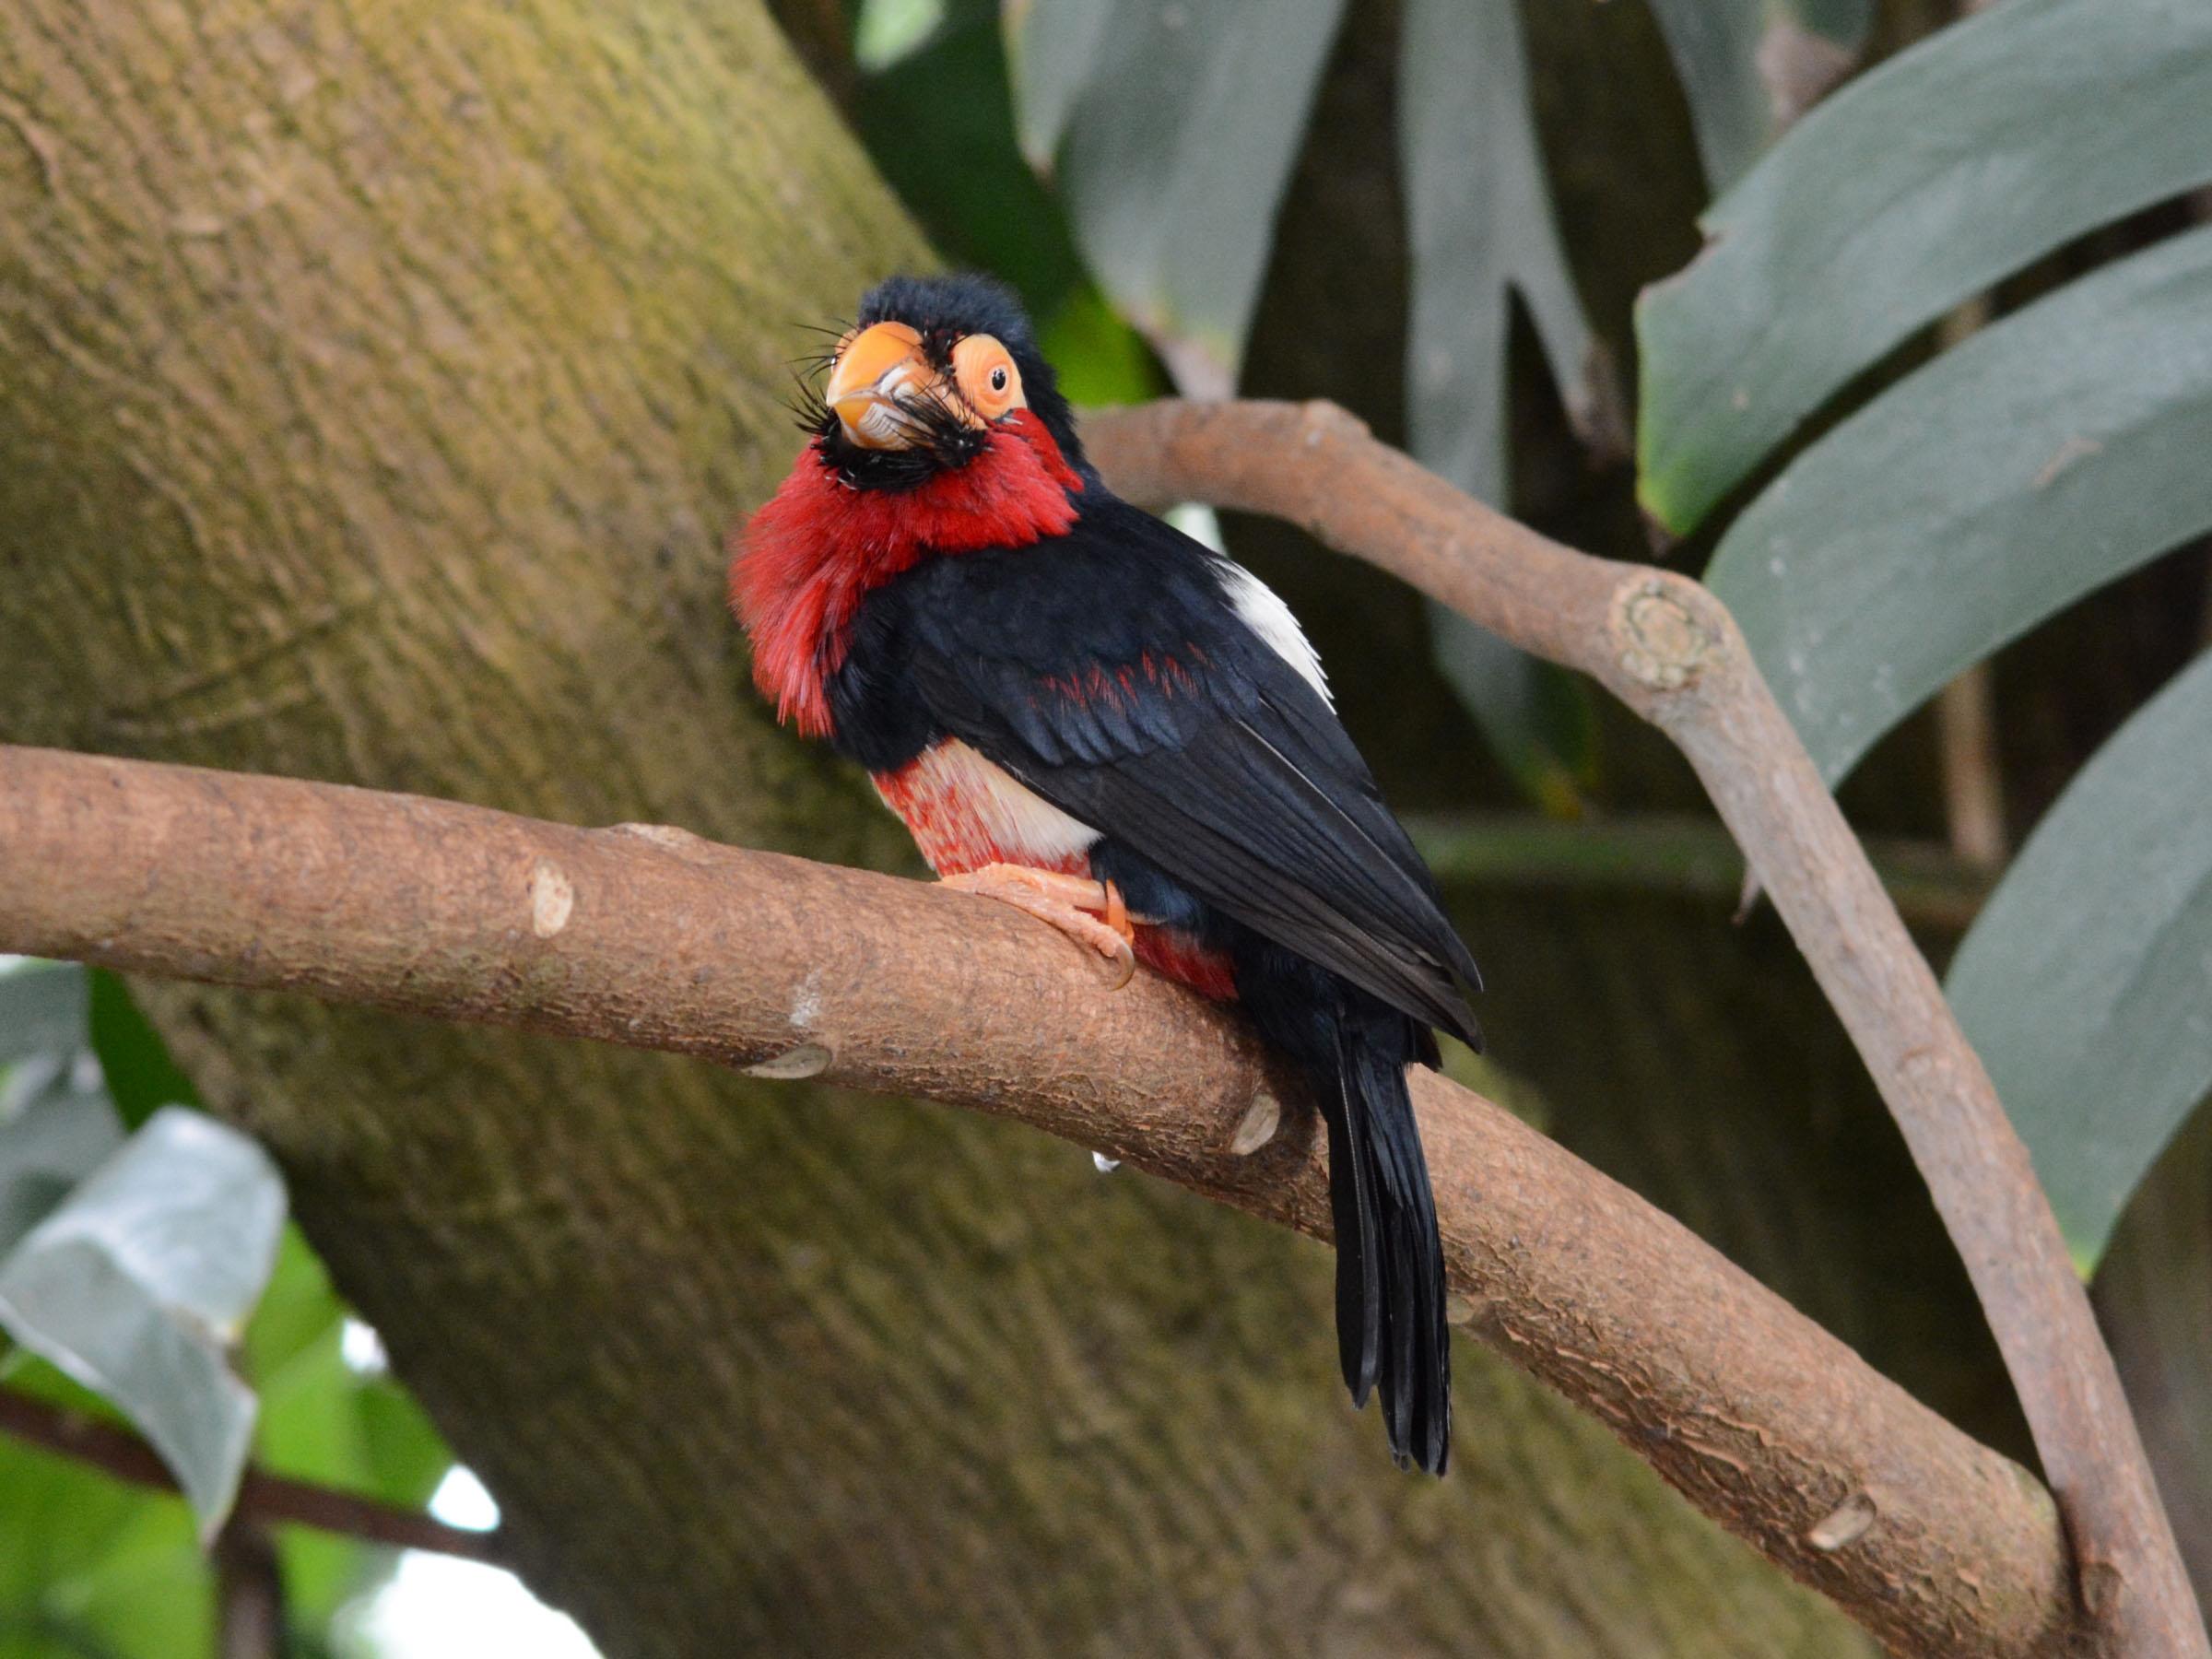 The Online Zoo - Moody Gardens Aquarium & Rainforest